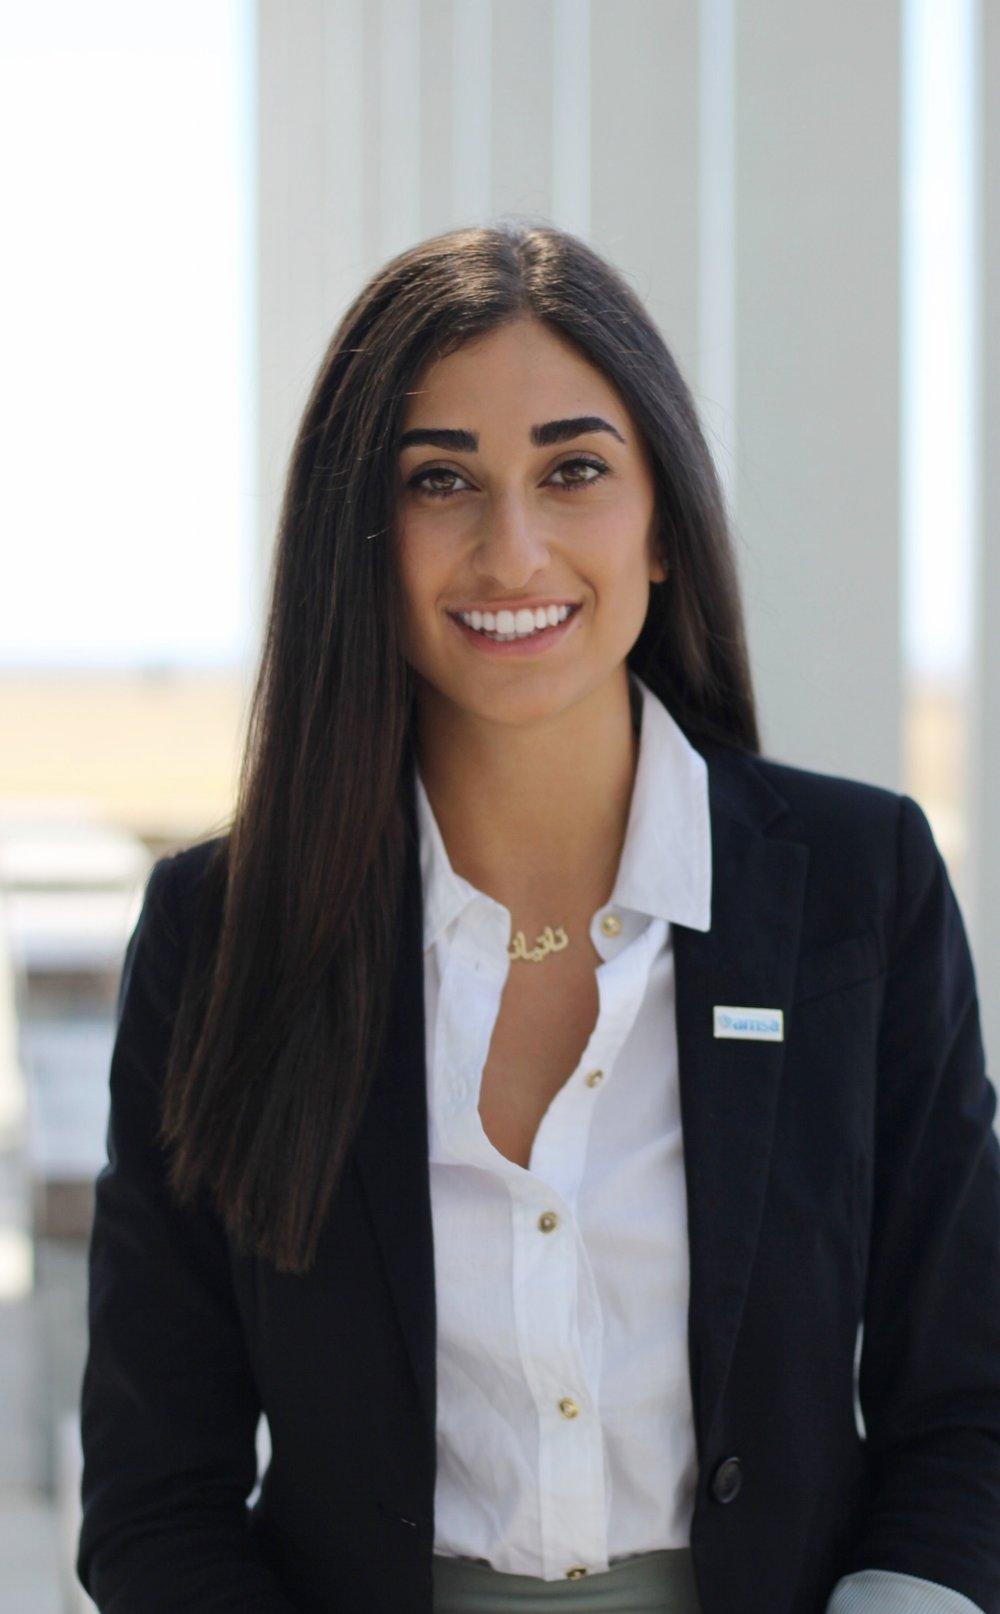 Tatiana Abdulnour: Vice President of Finance